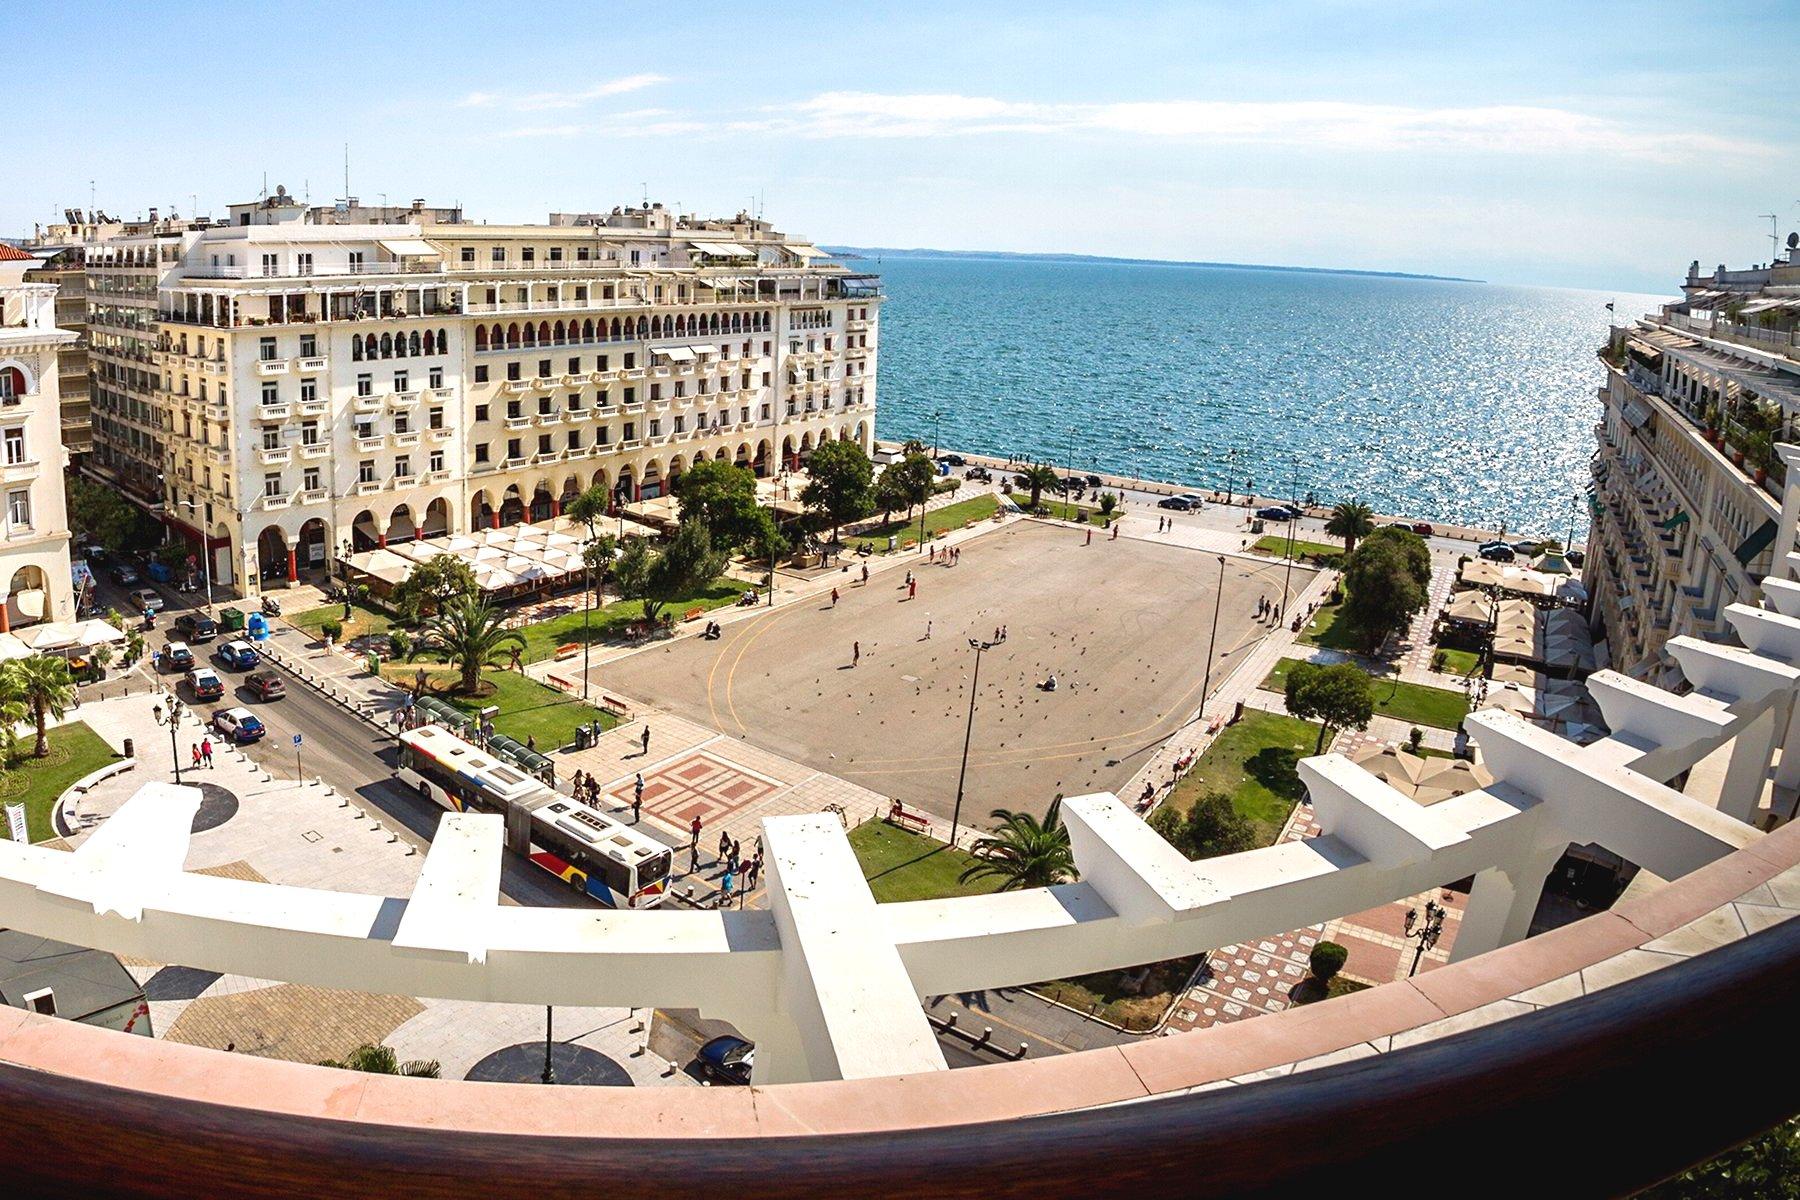 Let's take a walk in Thessaloniki. Aristotle Square.